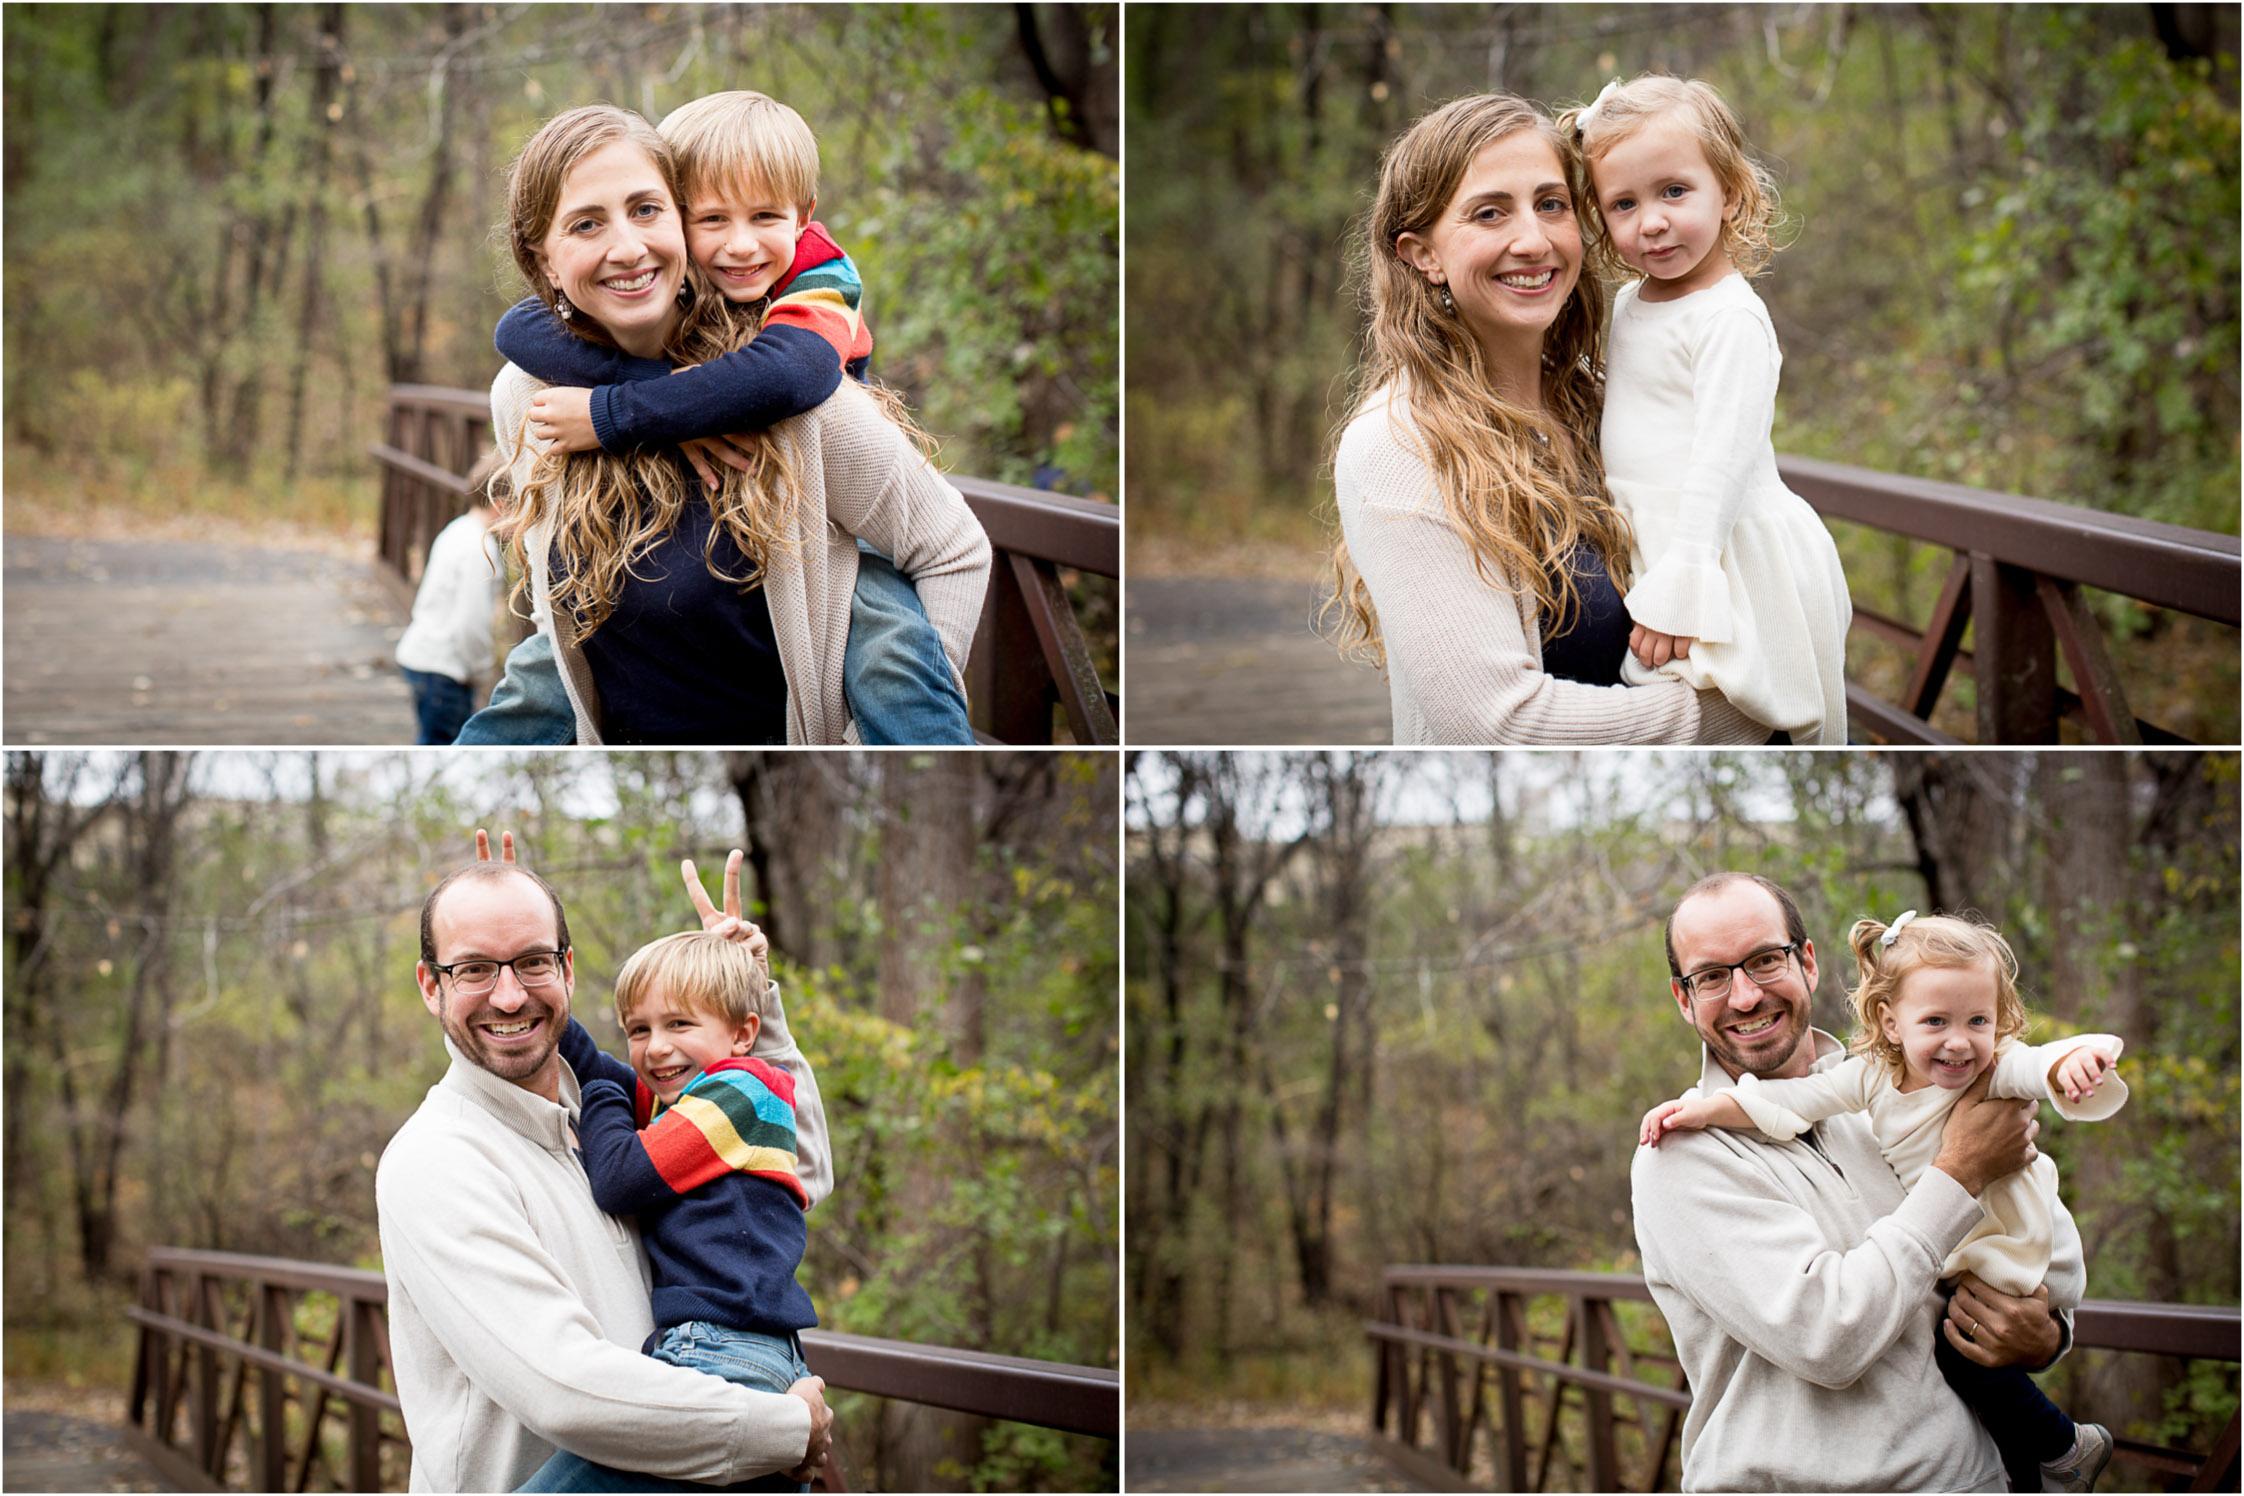 04-moir-park-minnesota-family-photographer-mother-son-father-daugther-hug-bunny-ears-fall-mn-mahonen-photography.jpg